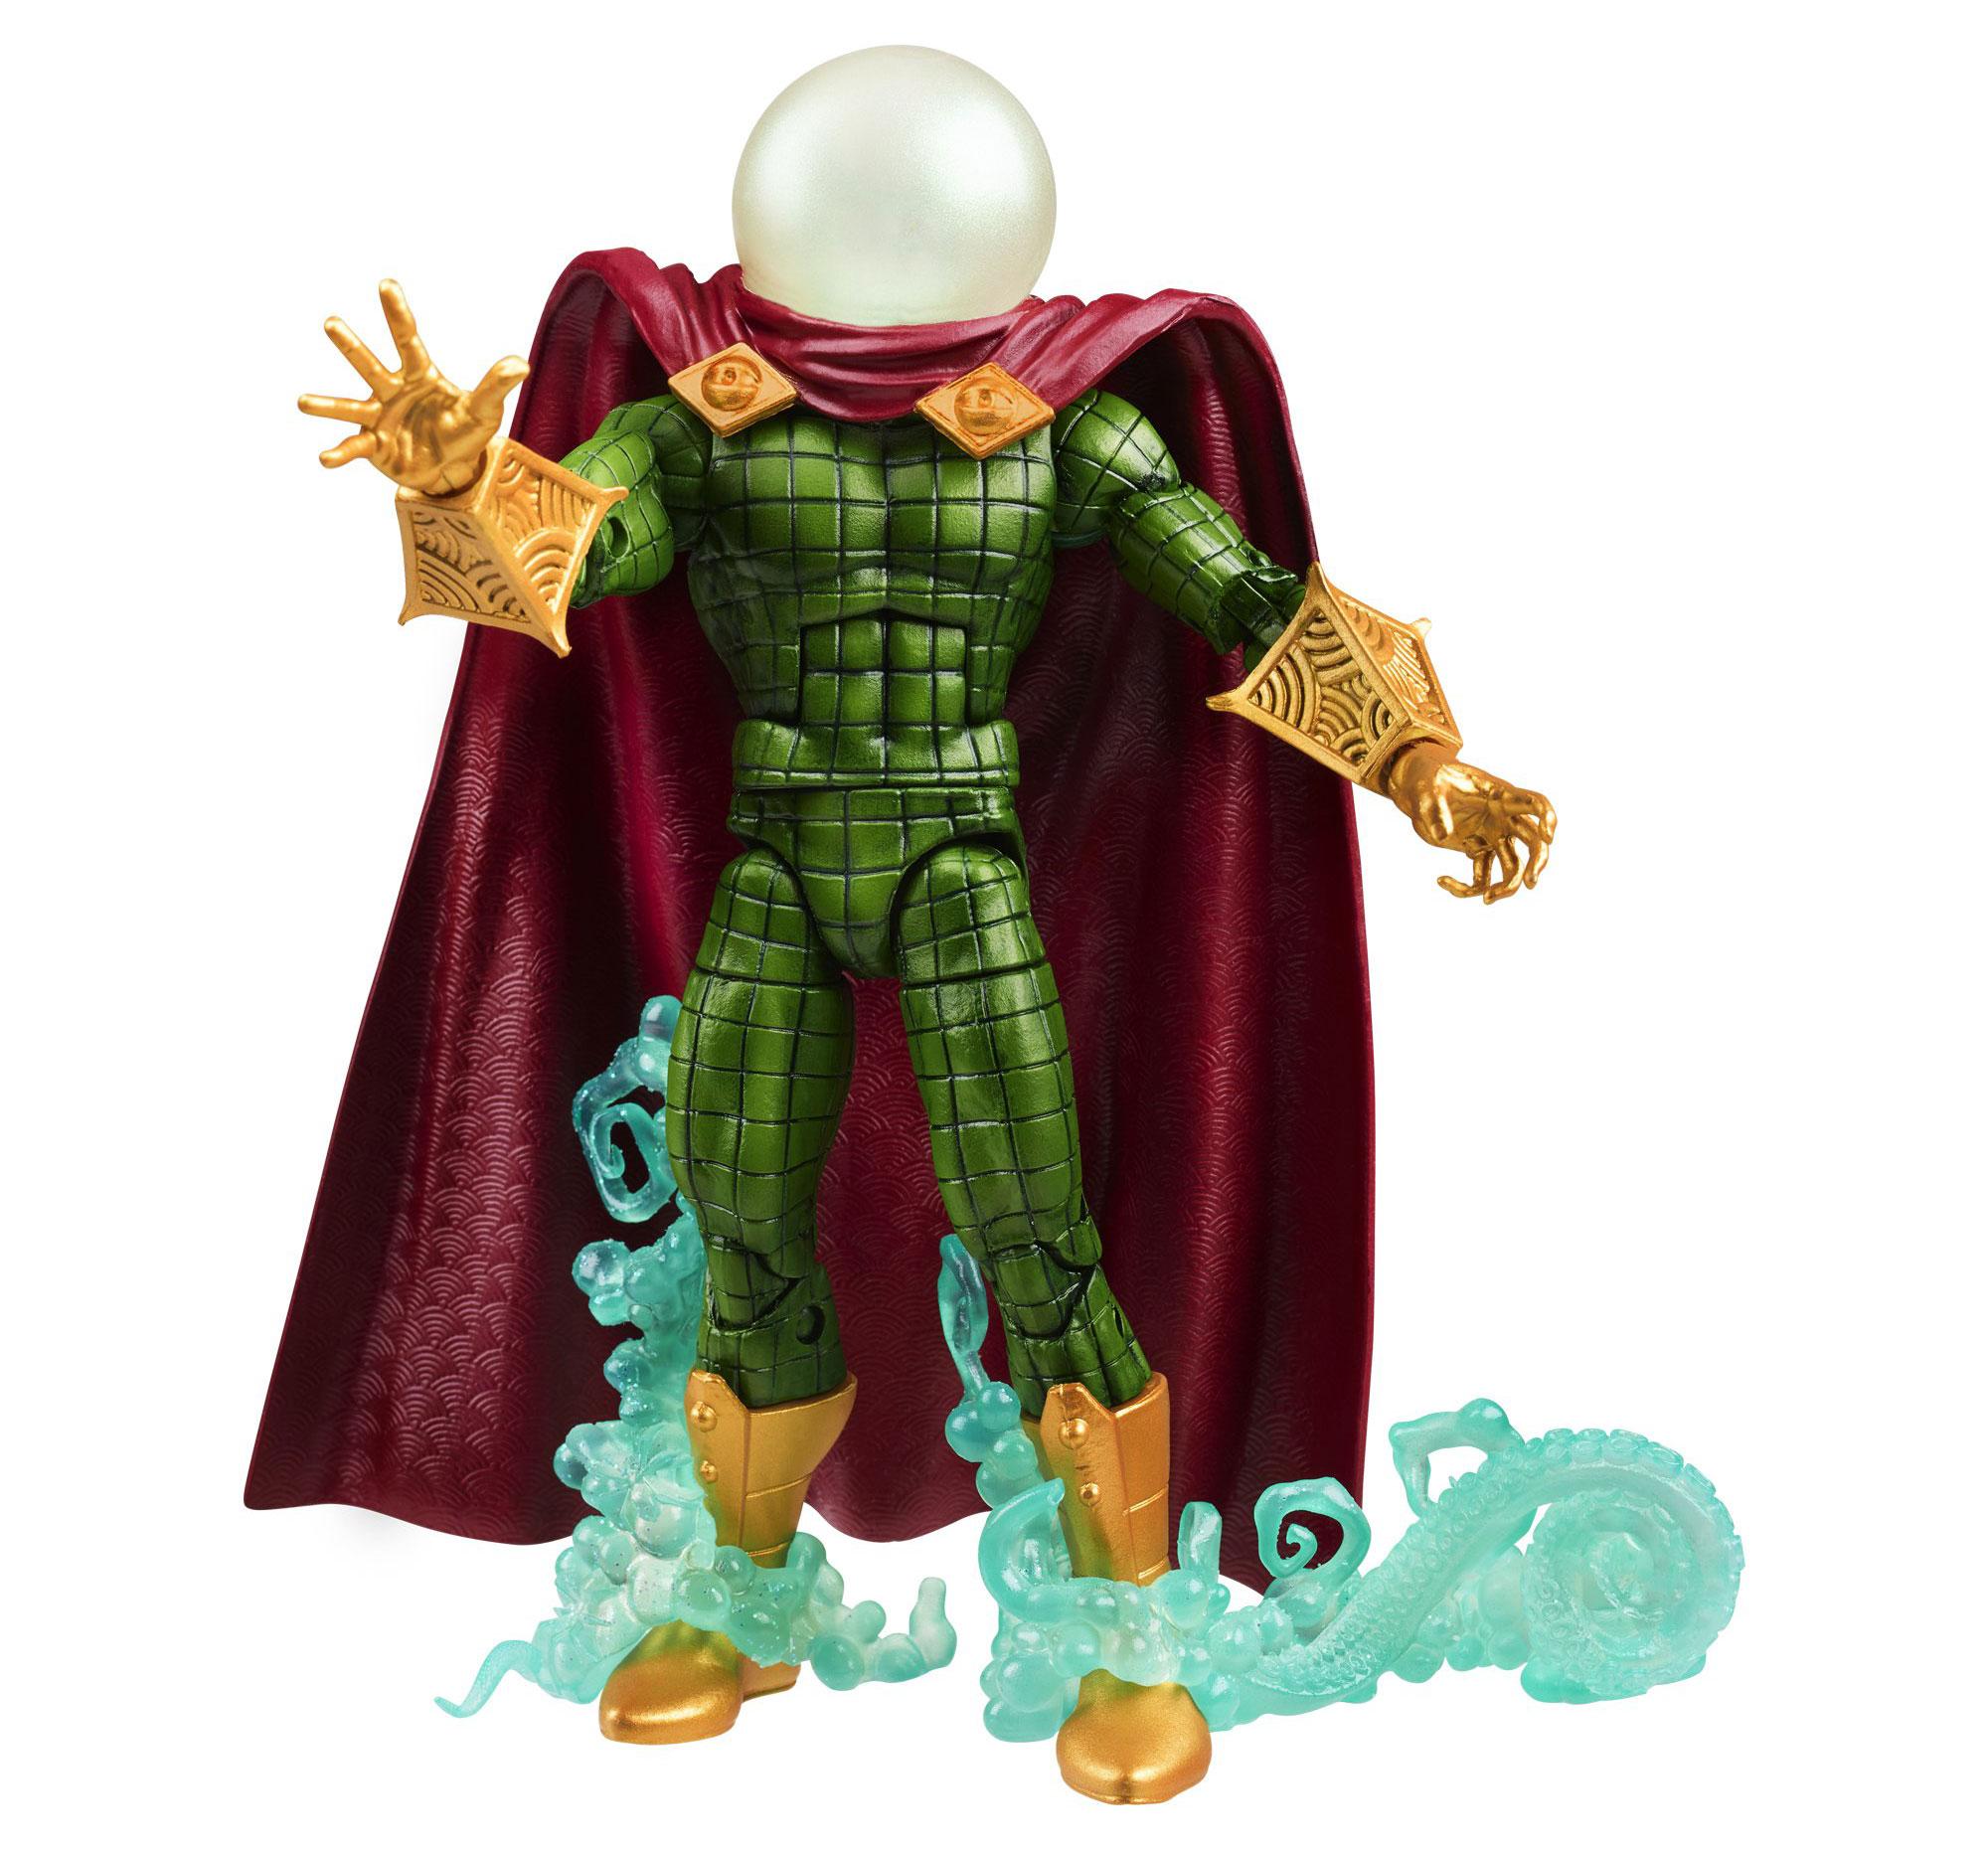 spider-man-marvel-legends-retro-mysterio-action-figure